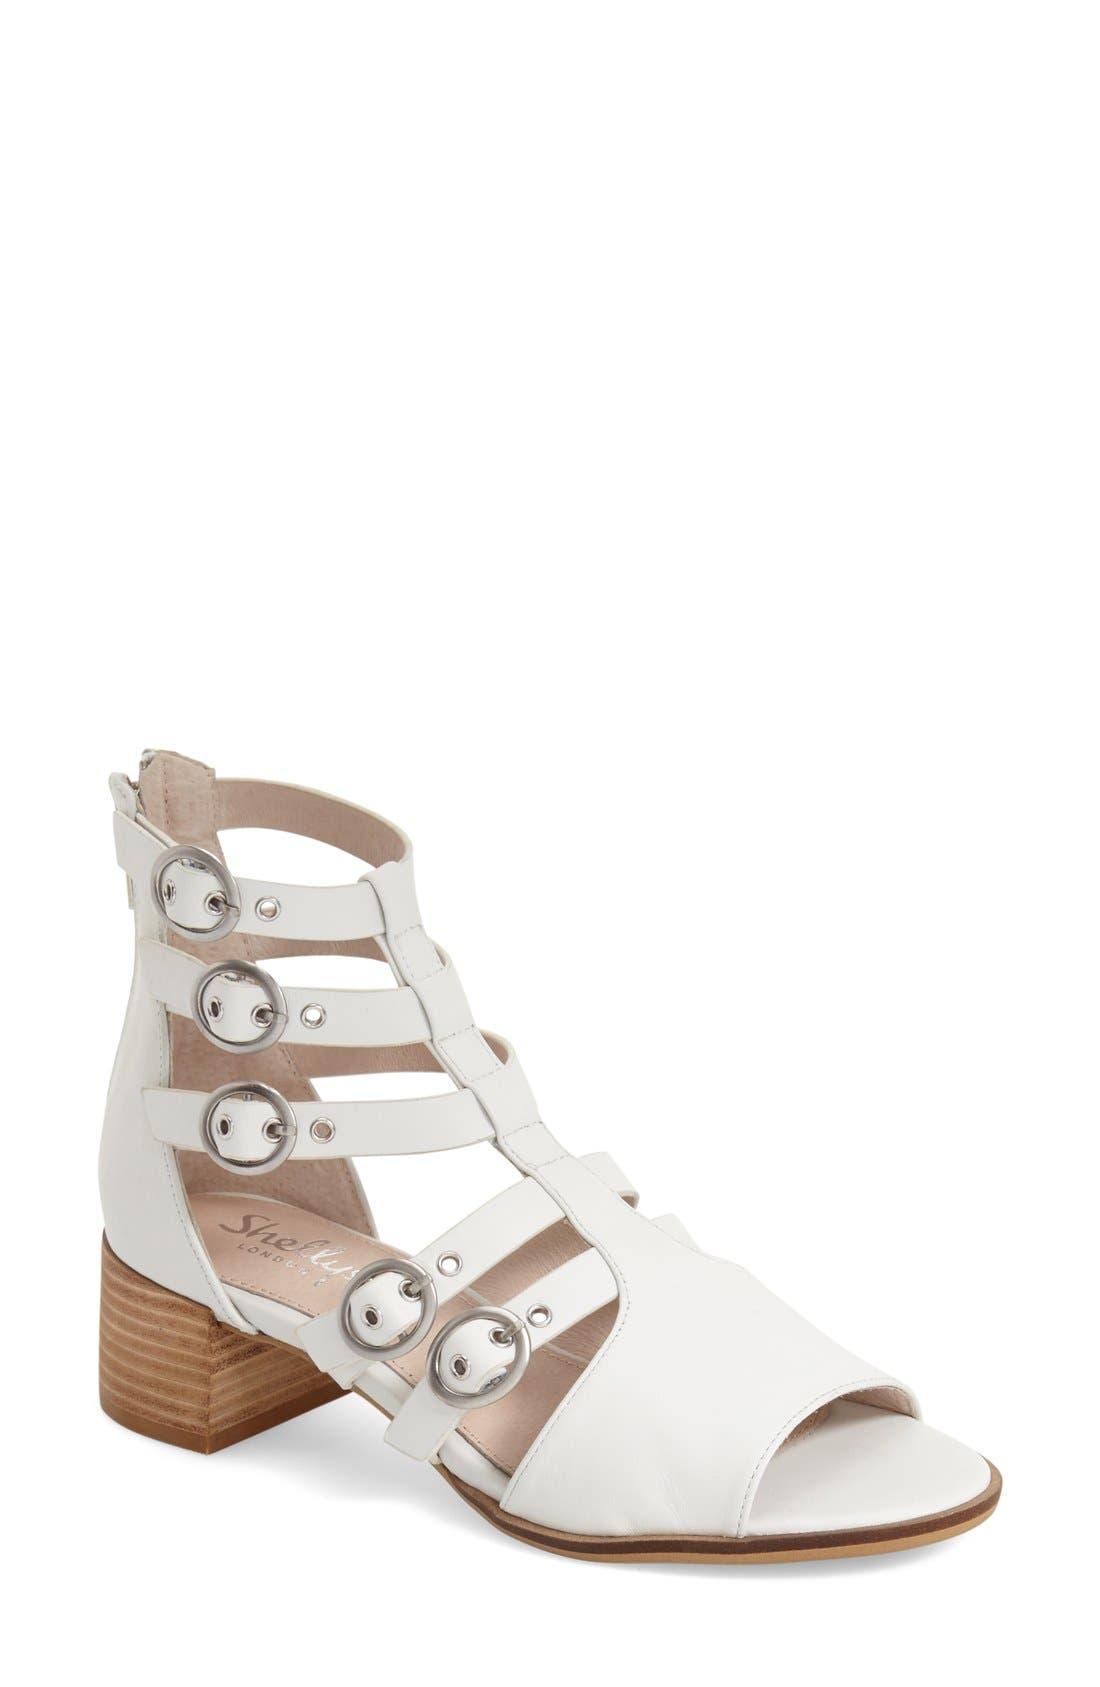 Alternate Image 1 Selected - Shellys London 'Bea' Buckle Sandal (Women)